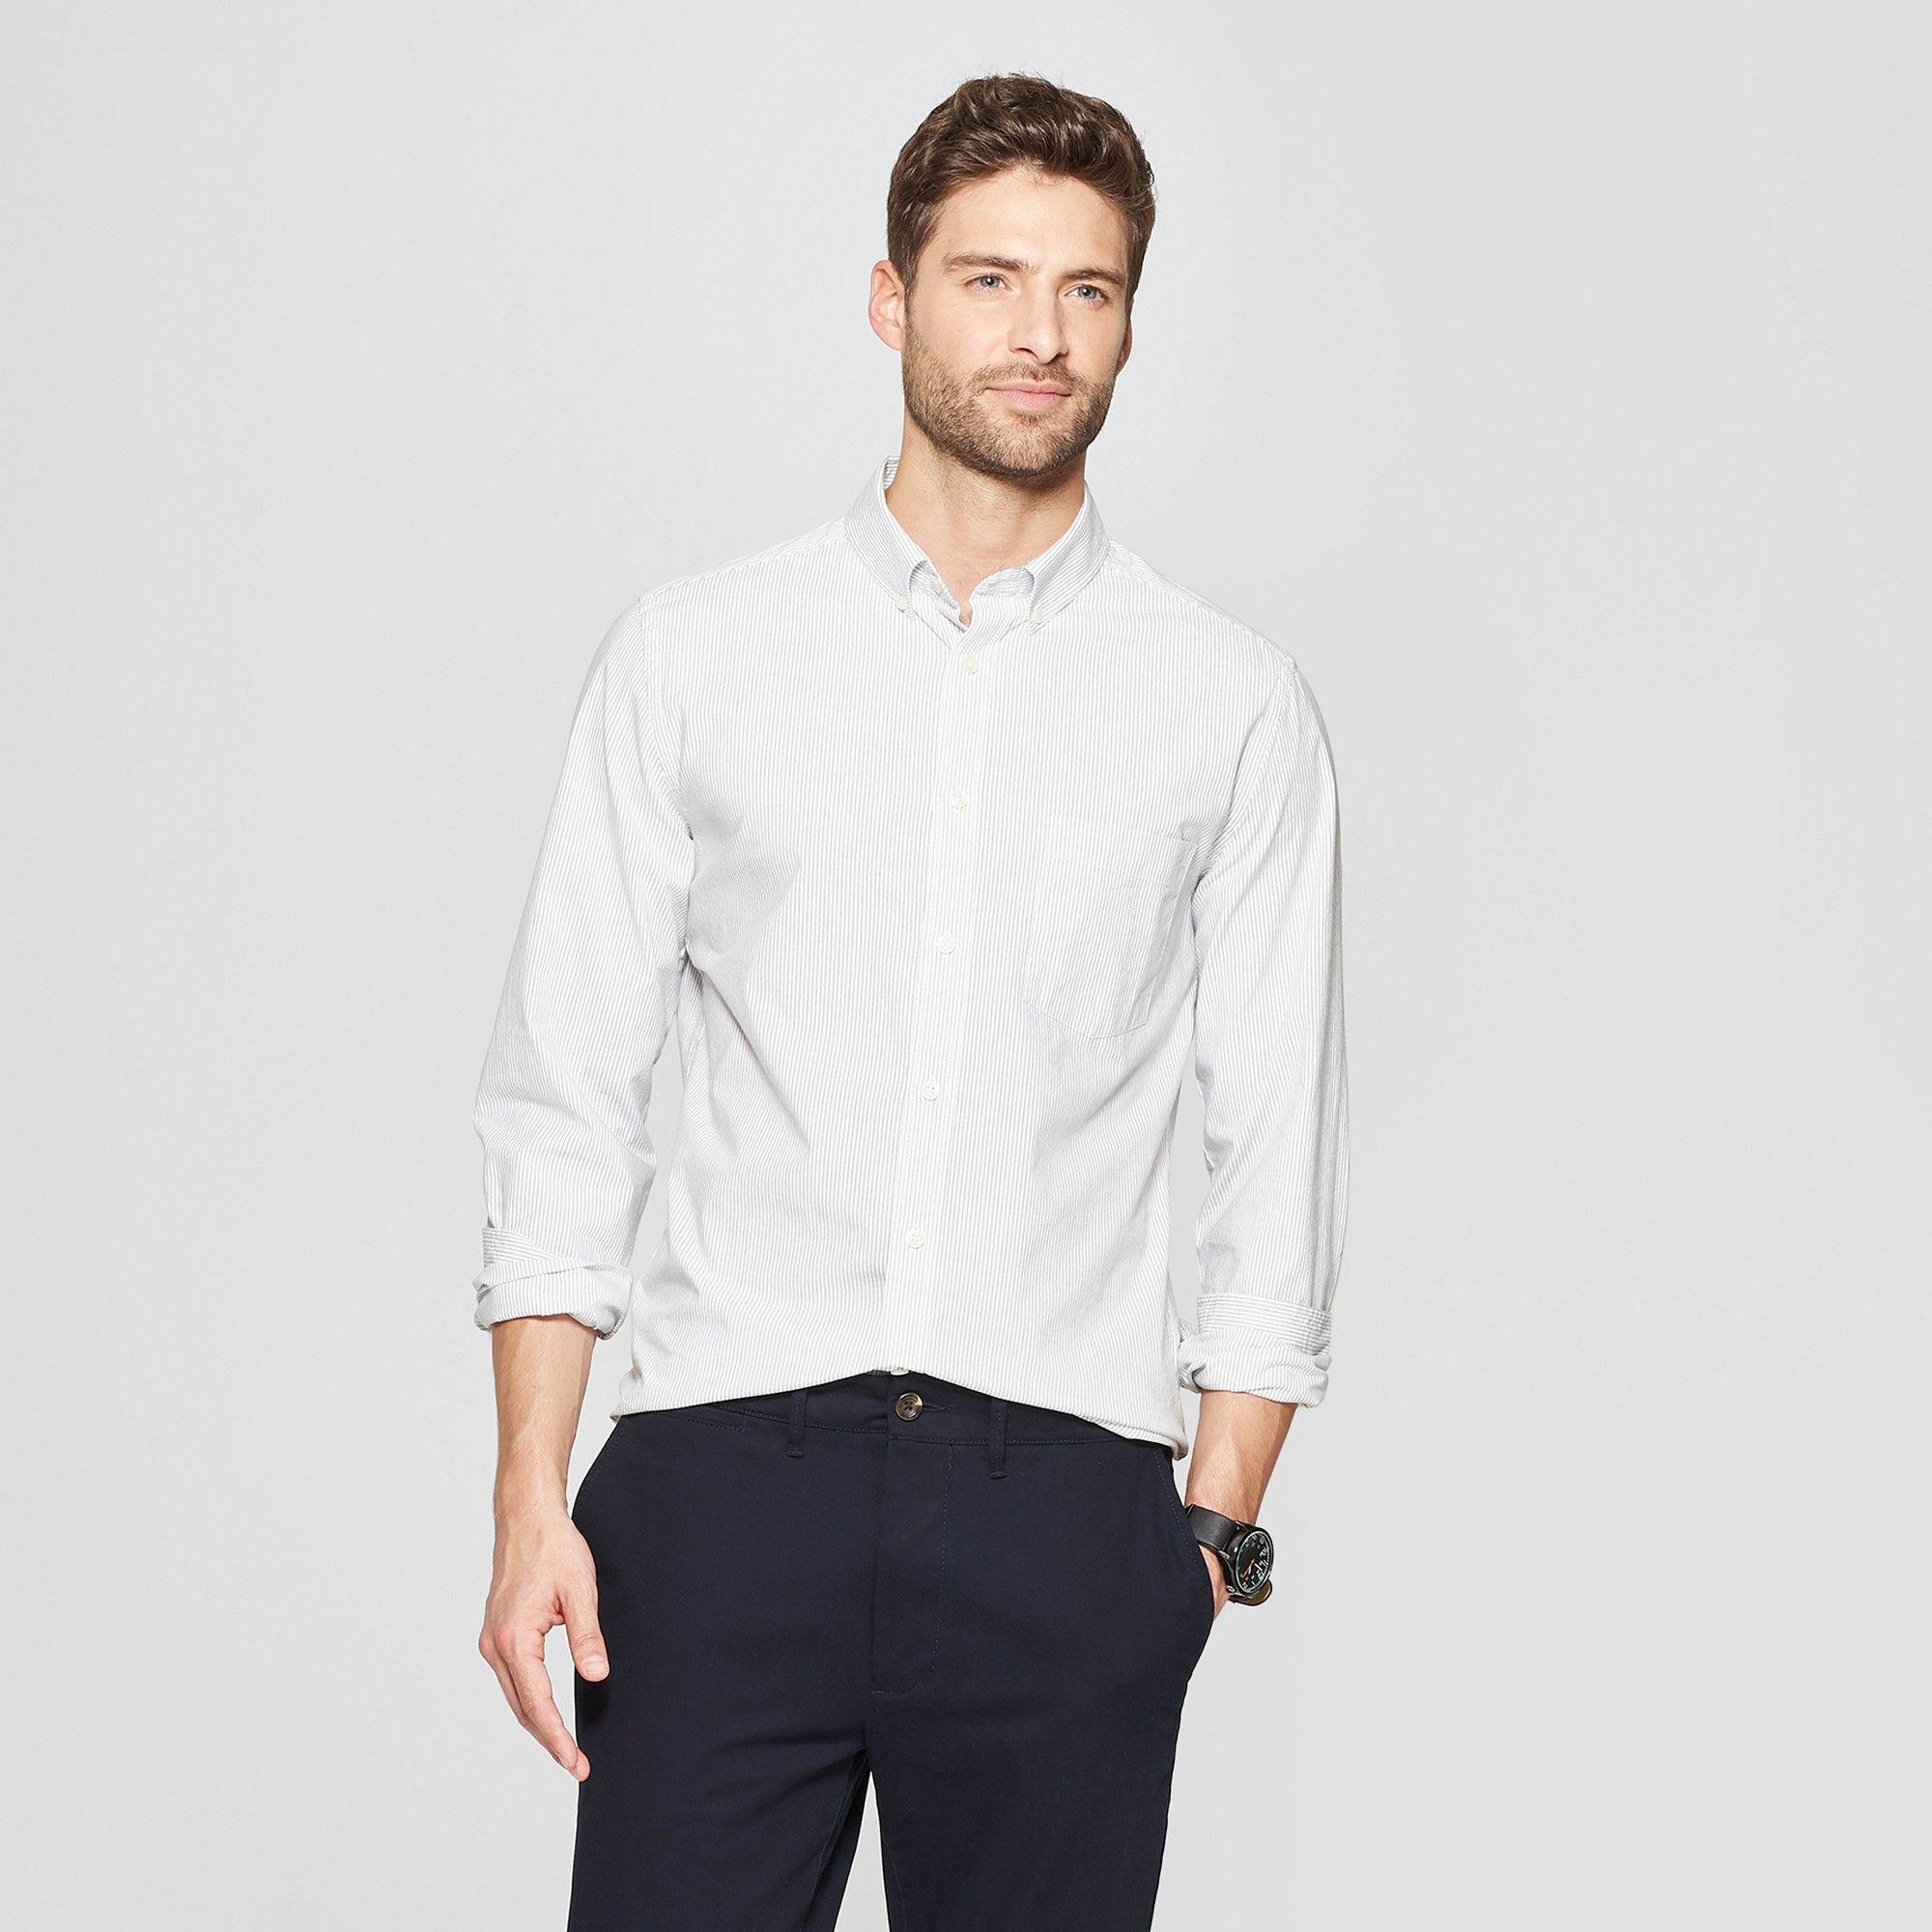 bd13d41a657 Men's Striped Slim Fit Long Sleeve Northrop Poplin Button-Down Shirt -  Goodfellow & Co White 2XL